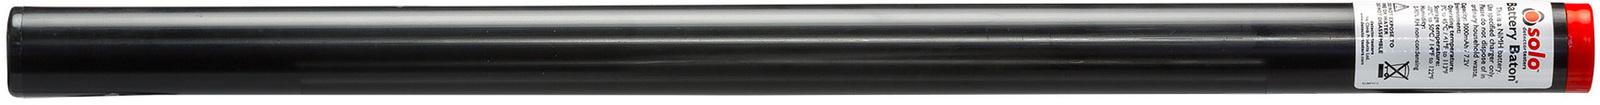 Detector Testers NiMH Battery Baton